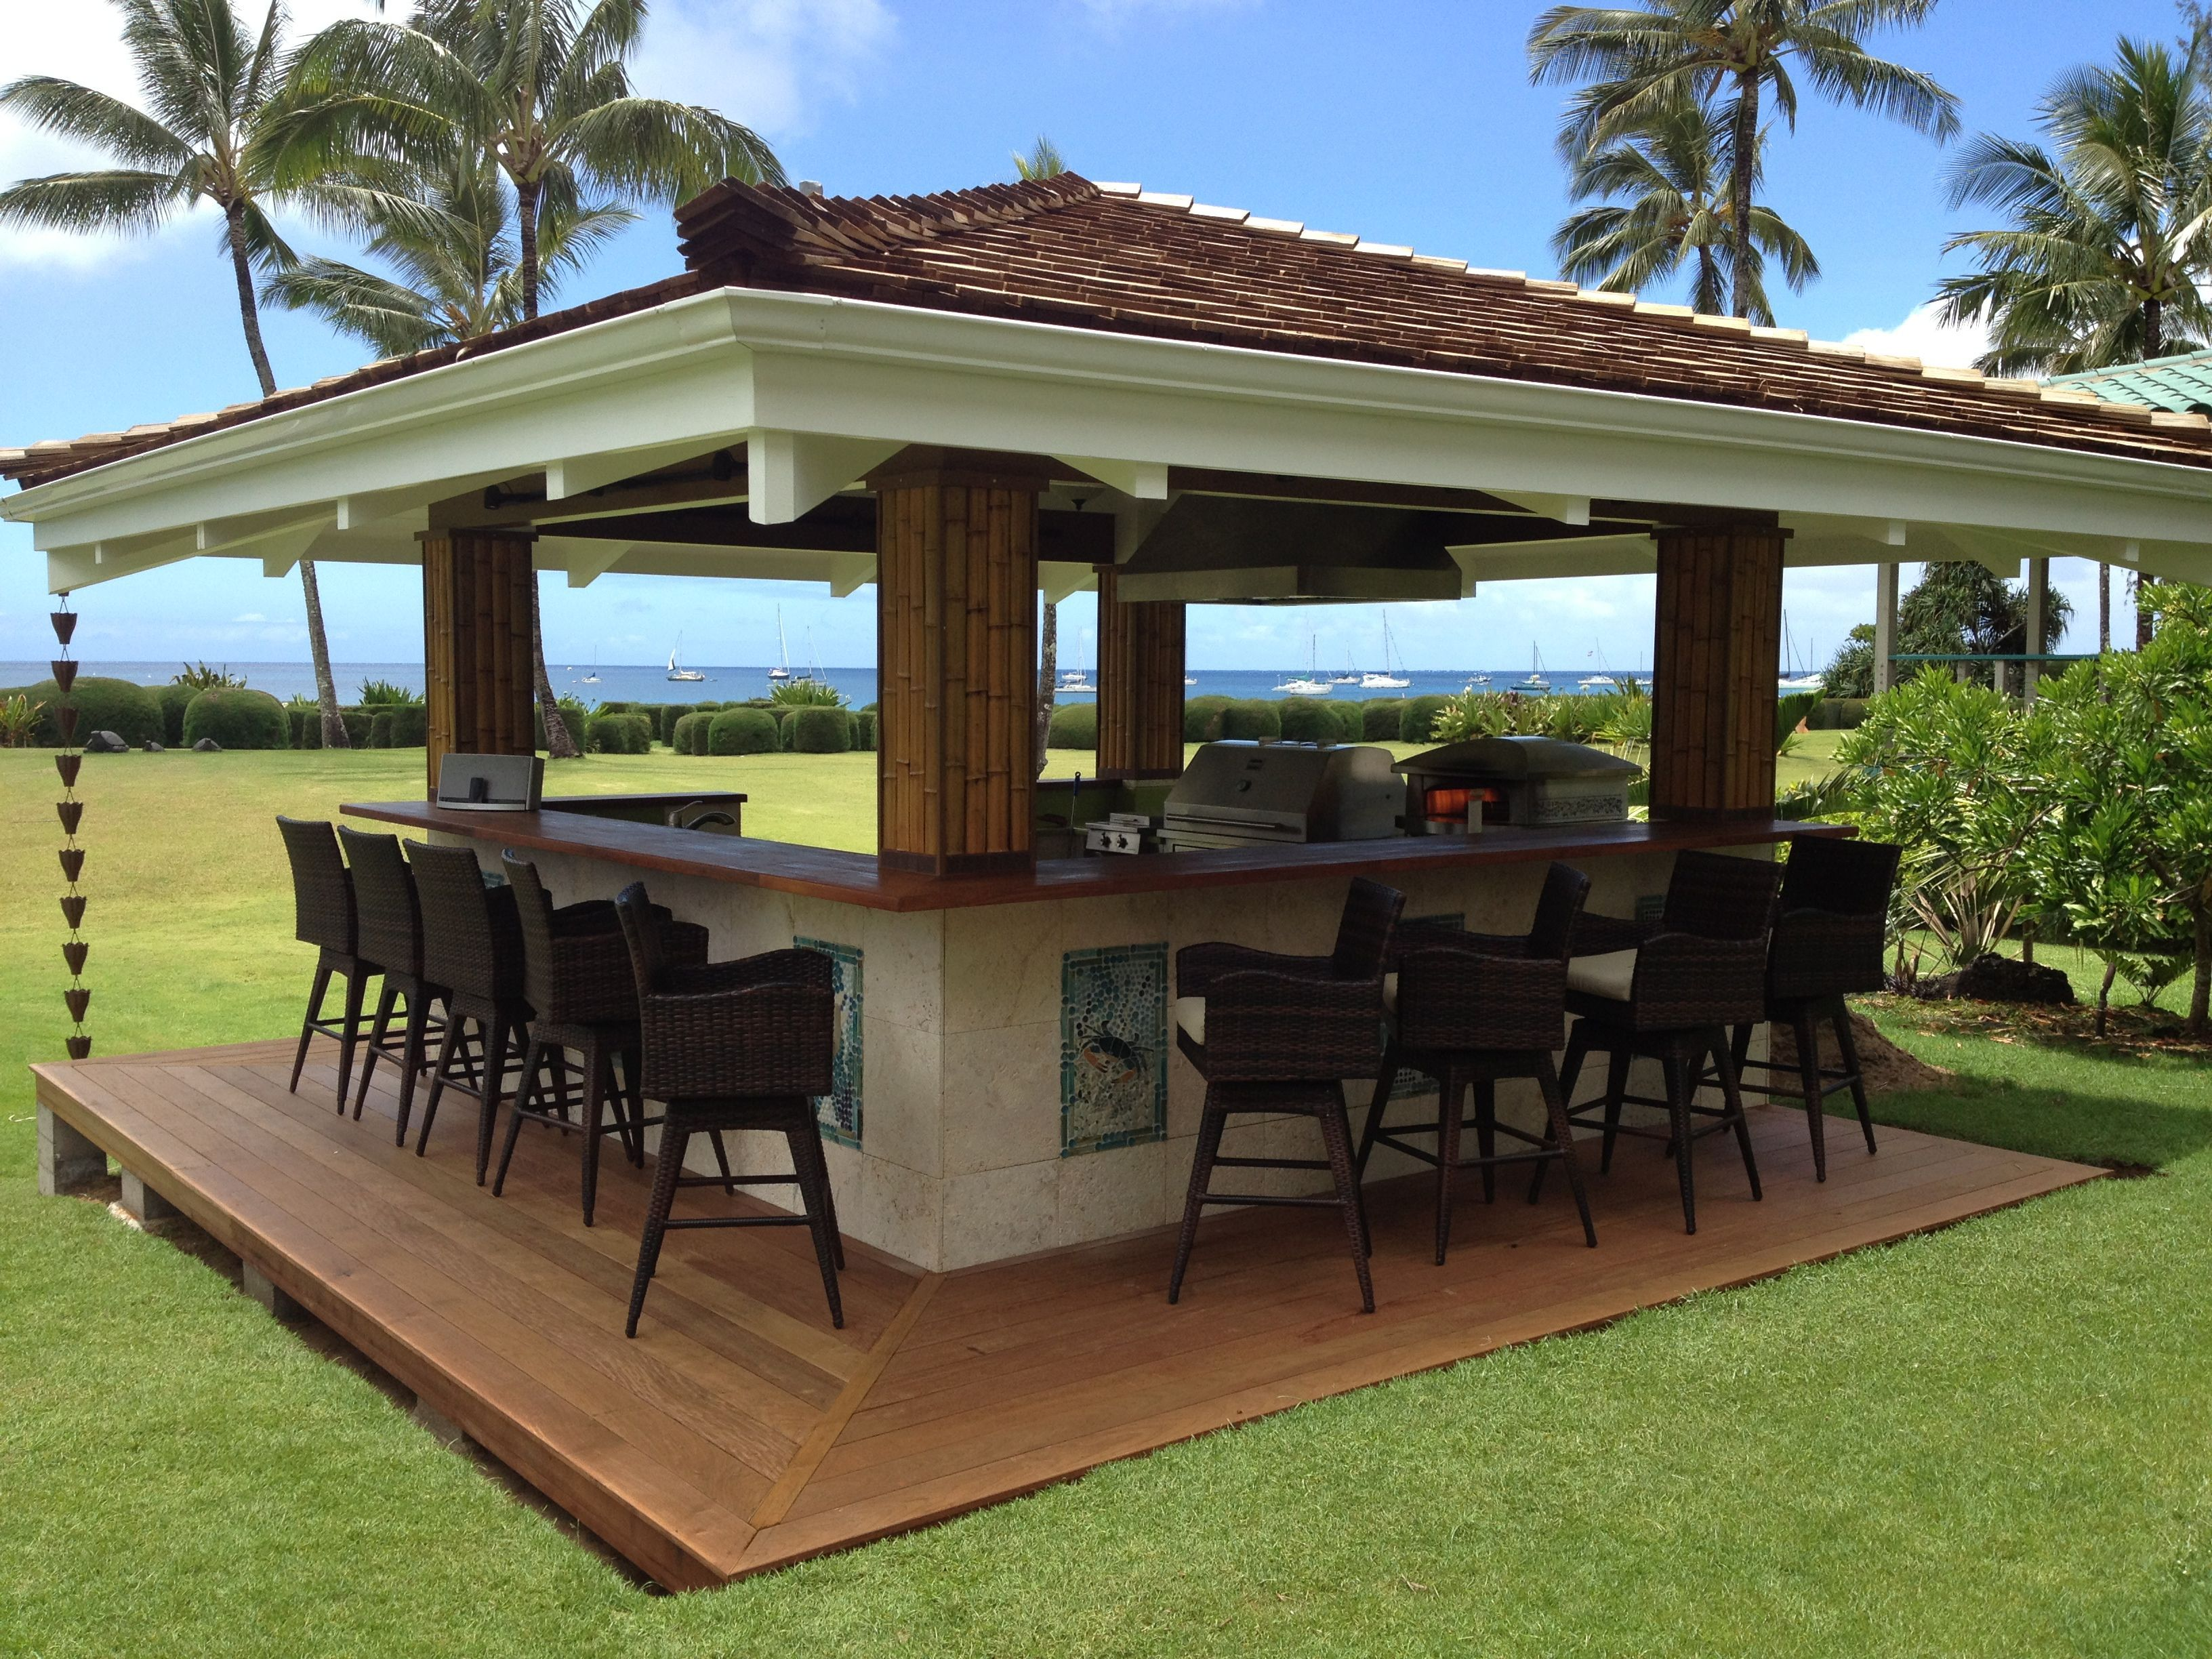 kalamazoo outdoor gourmet kitchen in hawaii outdoor outdoor kitchen design backyard patio on outdoor kitchen yard id=24699